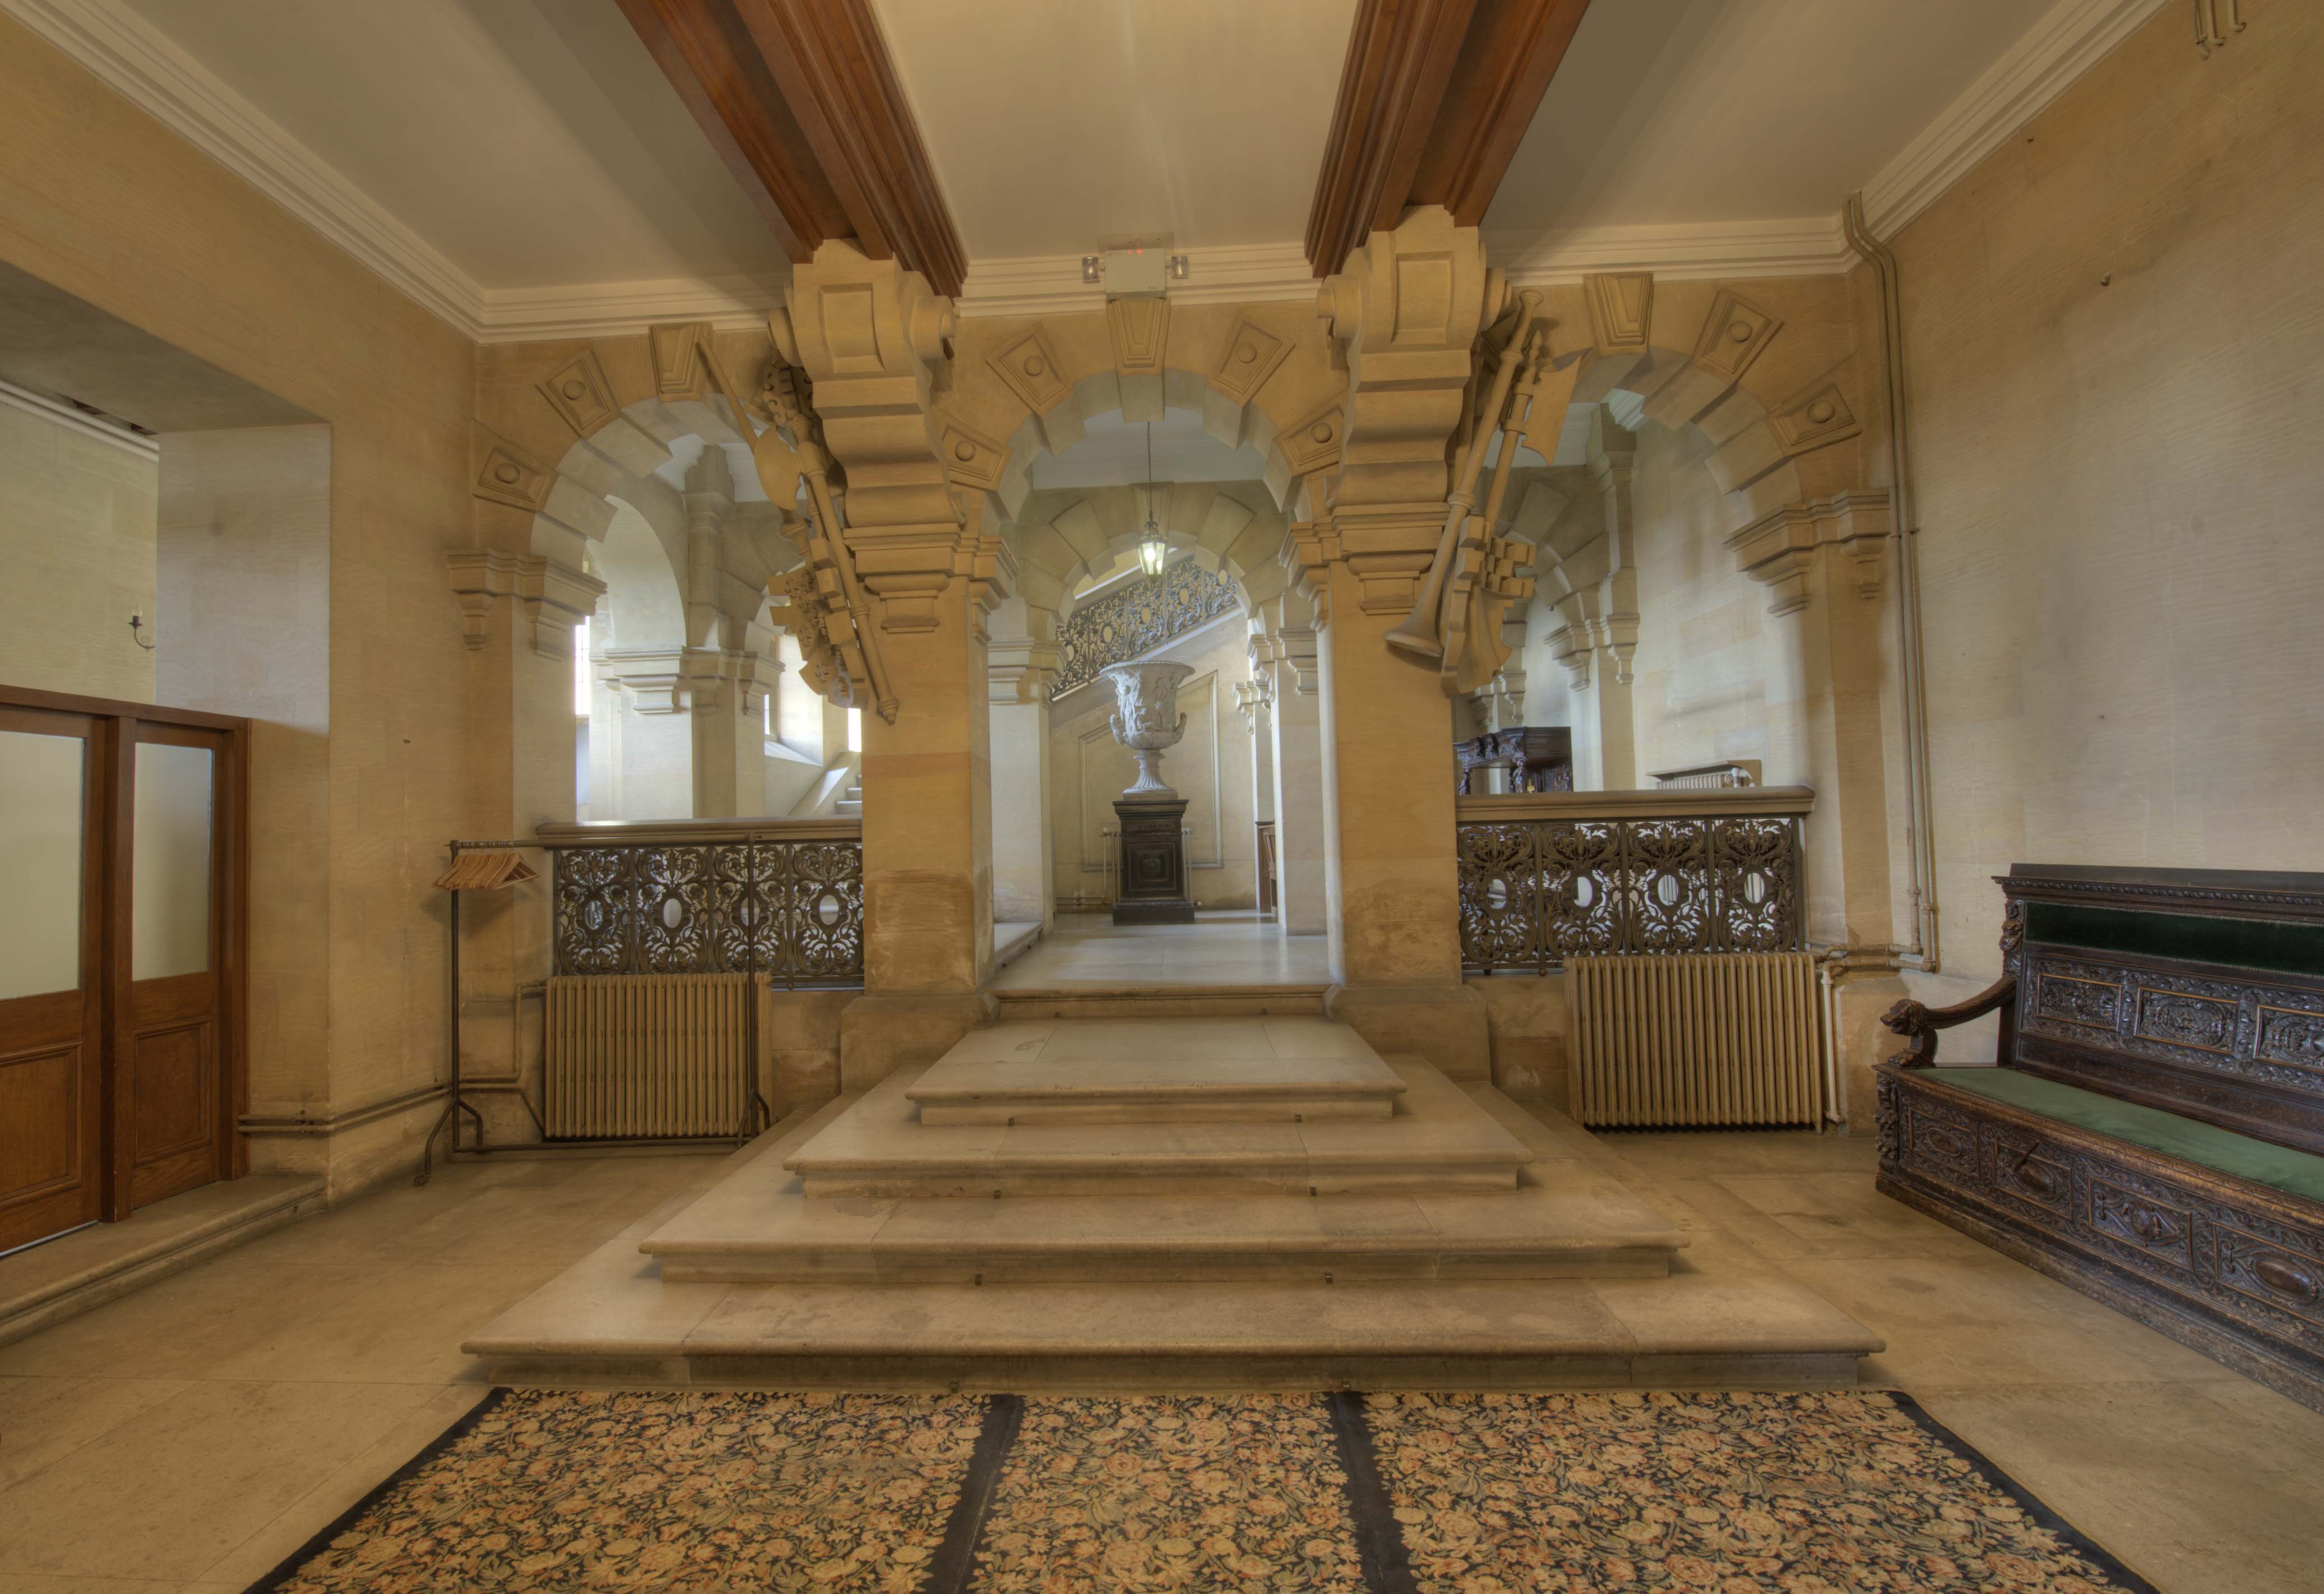 Entrance Hall Harlaxton Manor Archives - Dining Room Doors